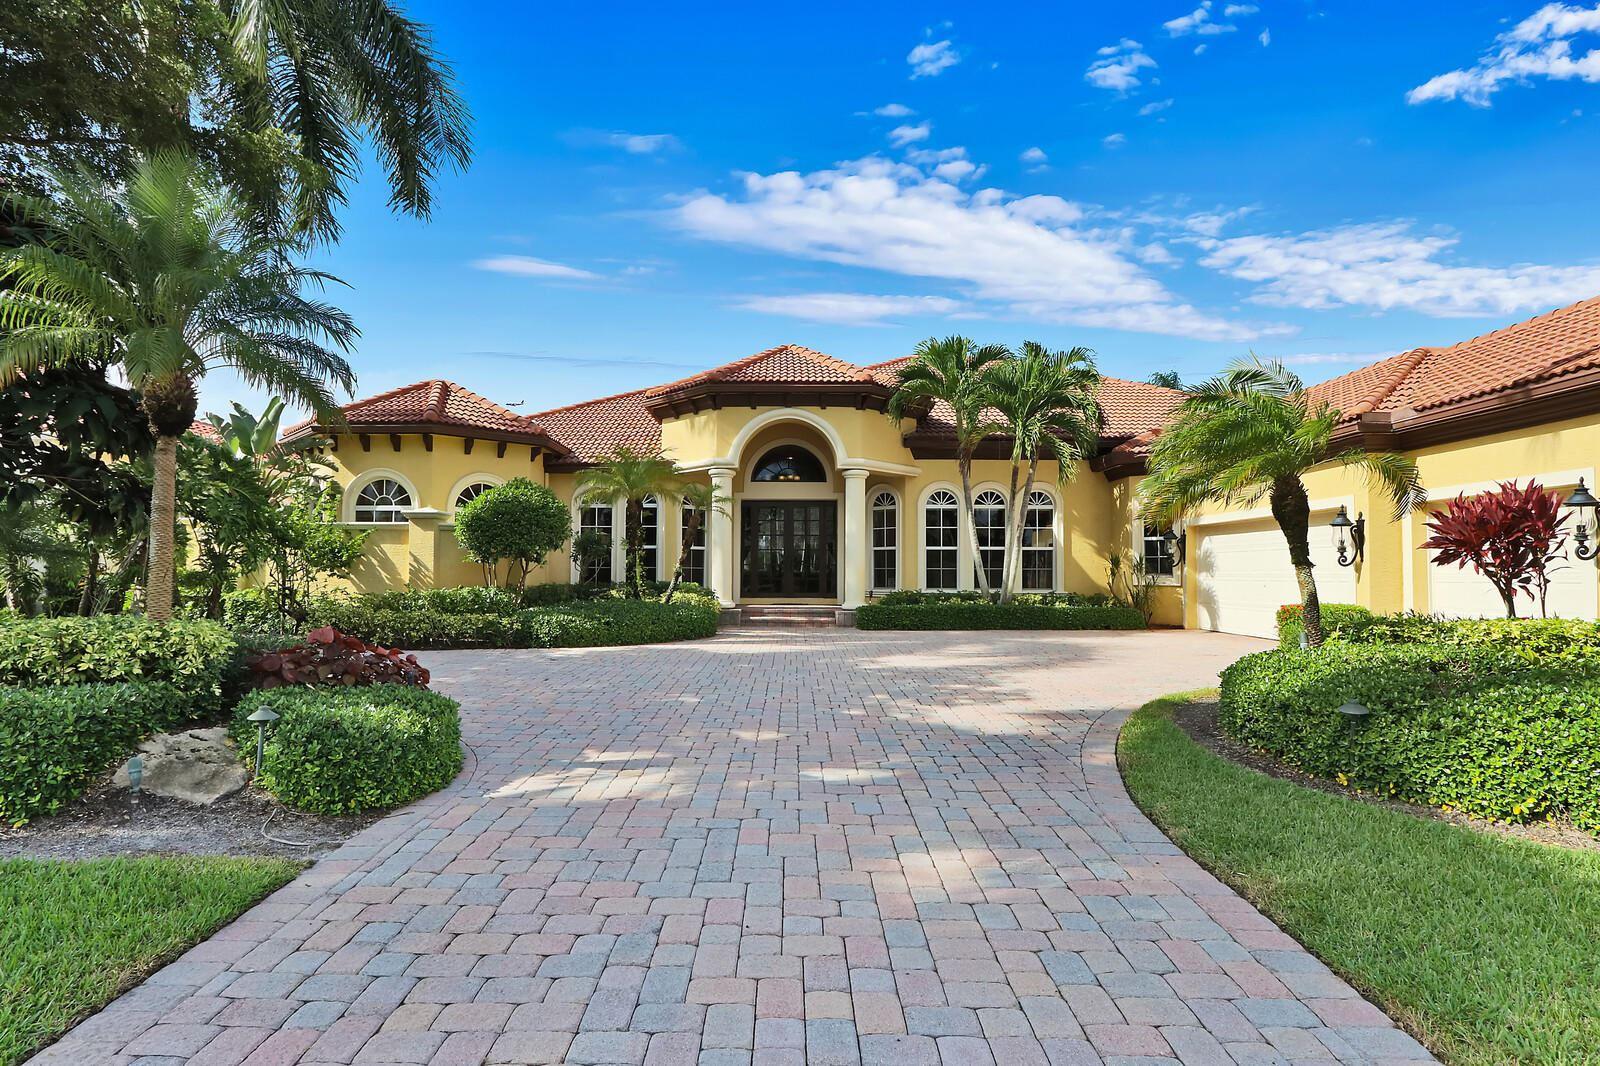 7517 Hawks Landing Drive, West Palm Beach, FL 33412 - #: RX-10662726